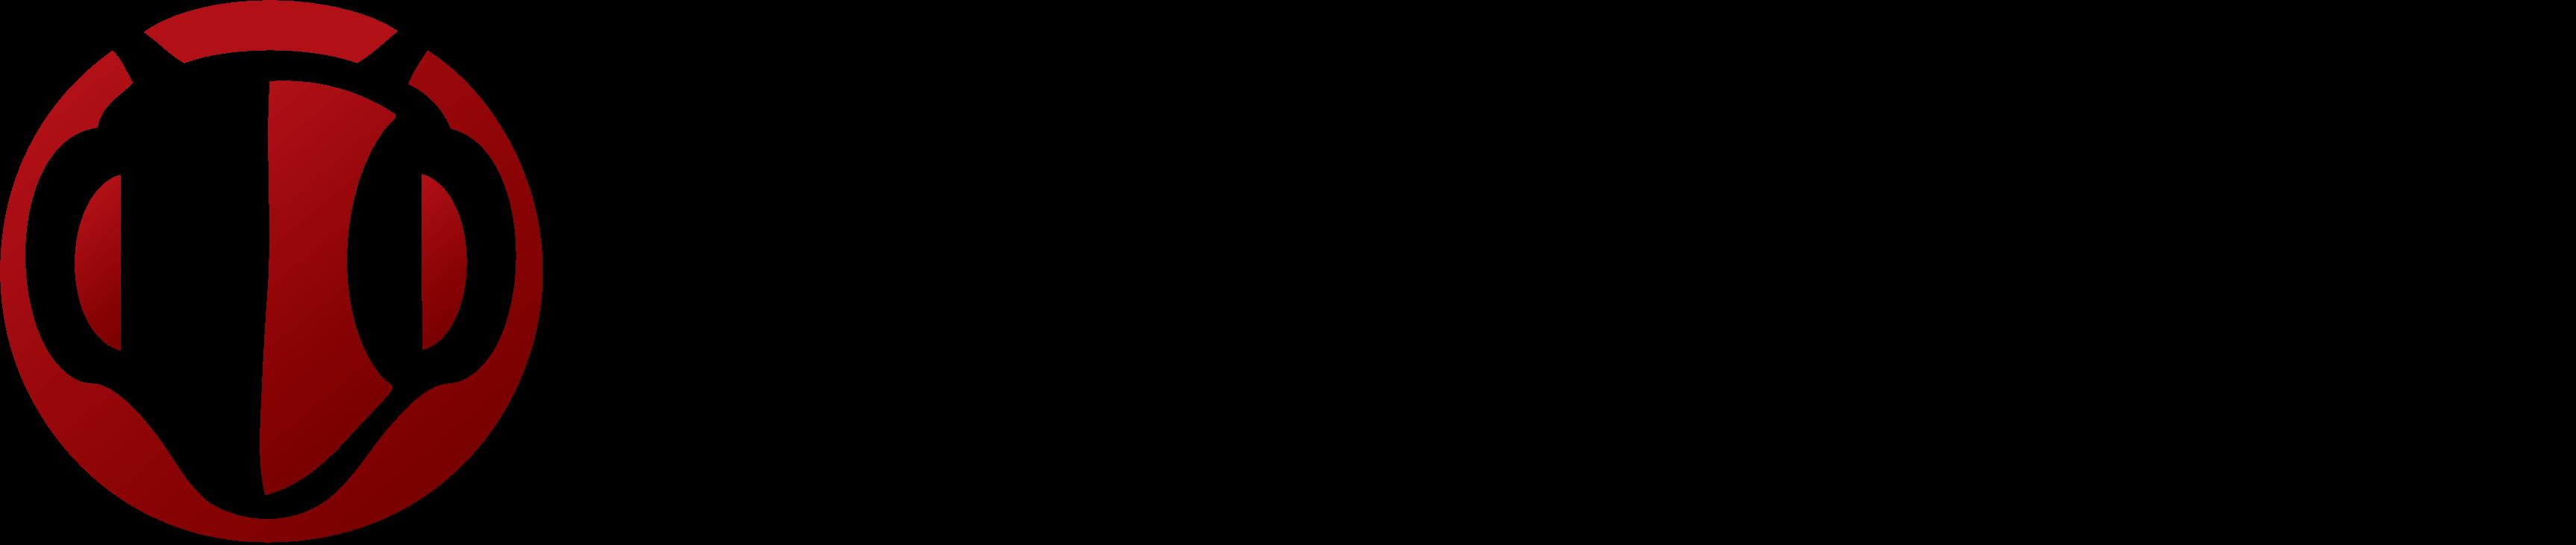 antonline.com